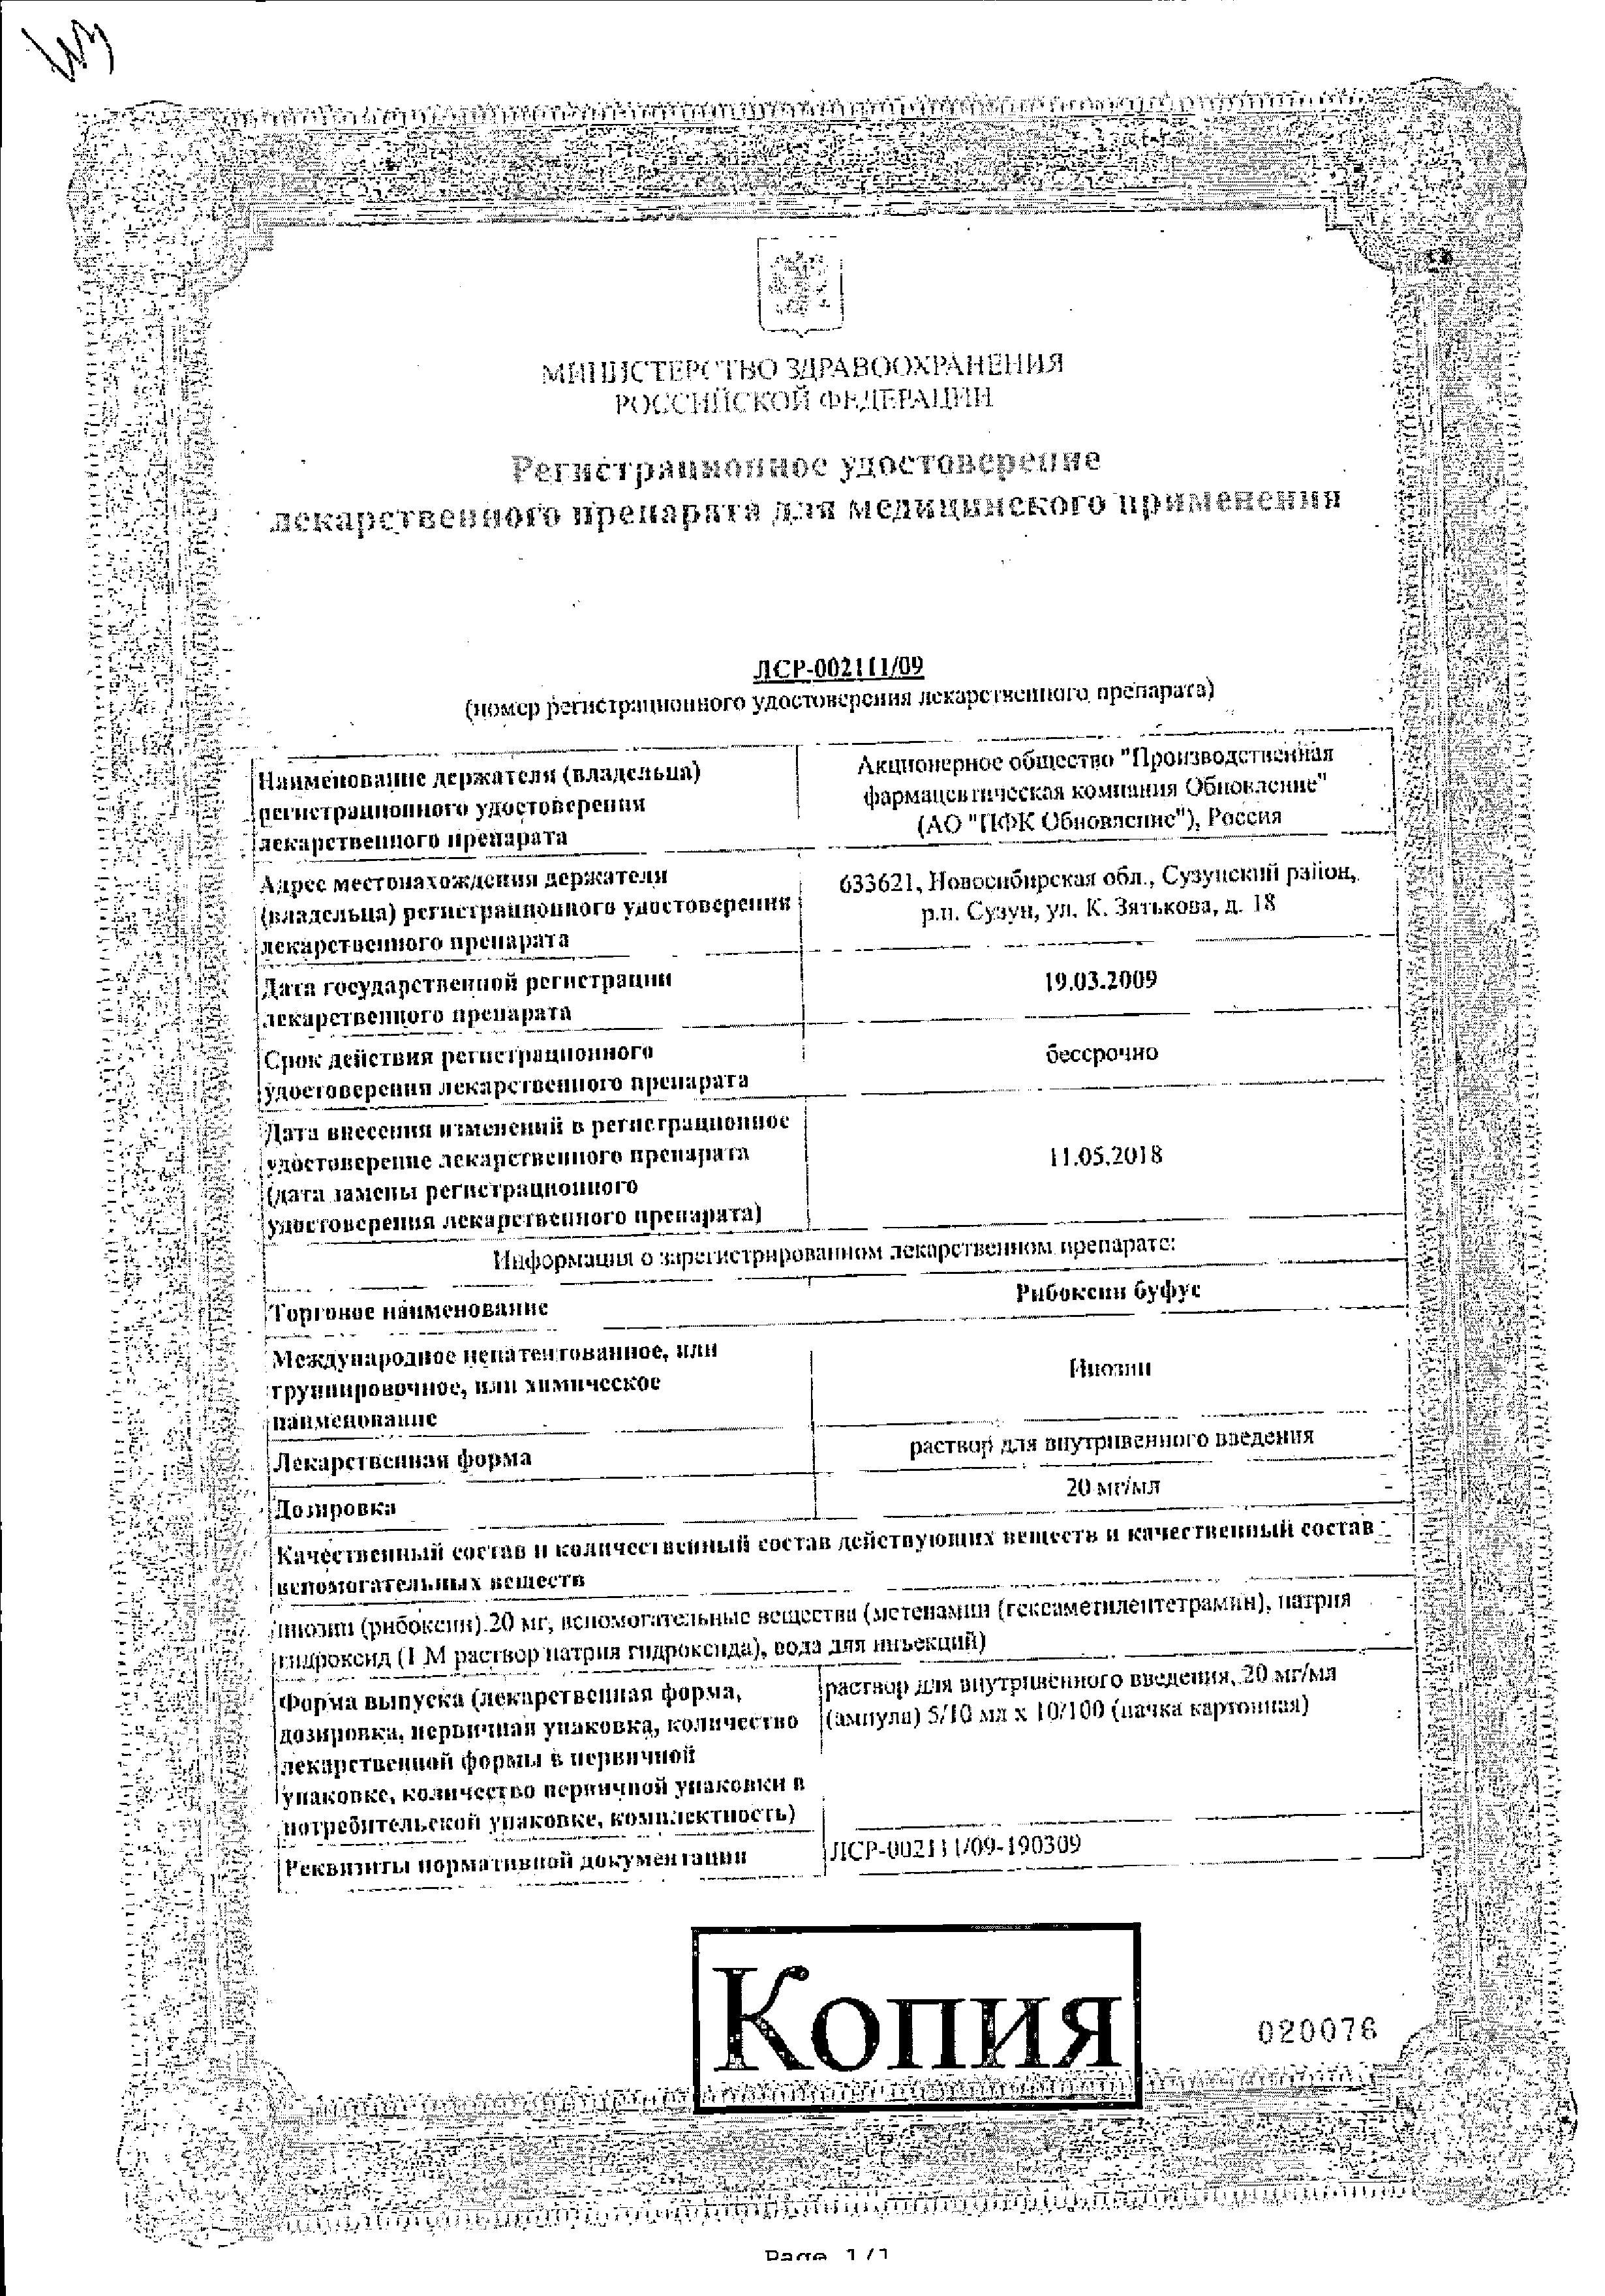 Рибоксин буфус сертификат